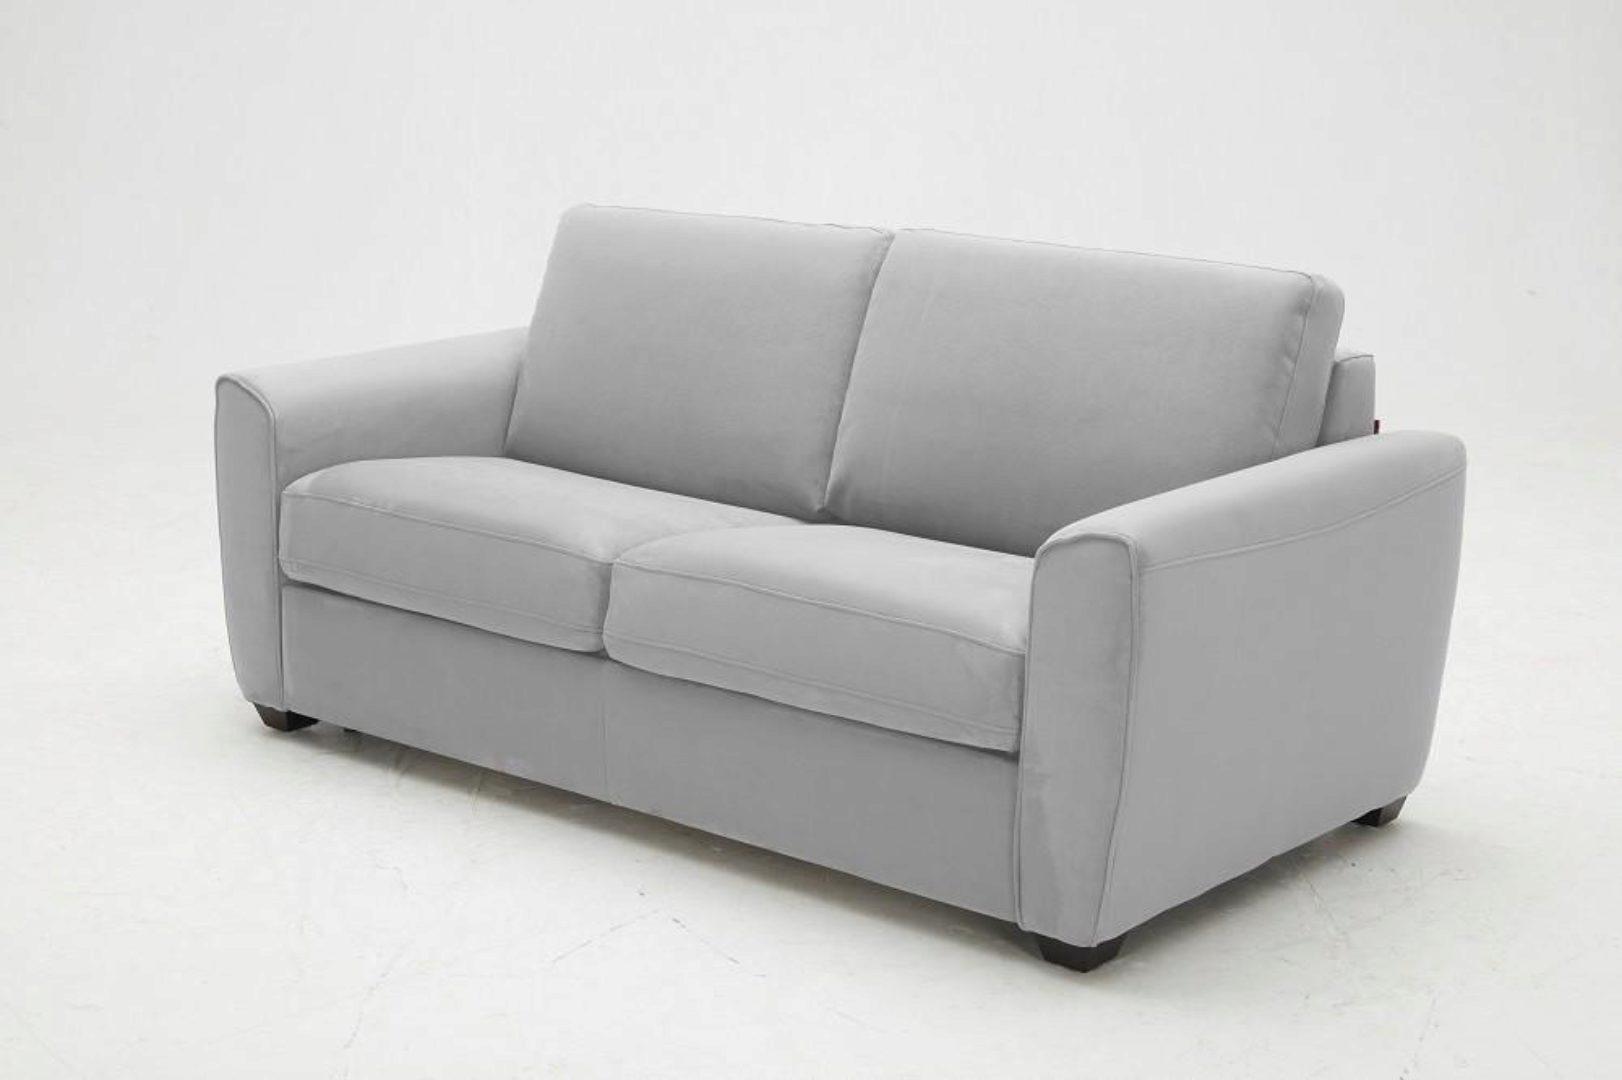 j m marin modern grey premium microfiber foam mattress sofa sleeper contemporary